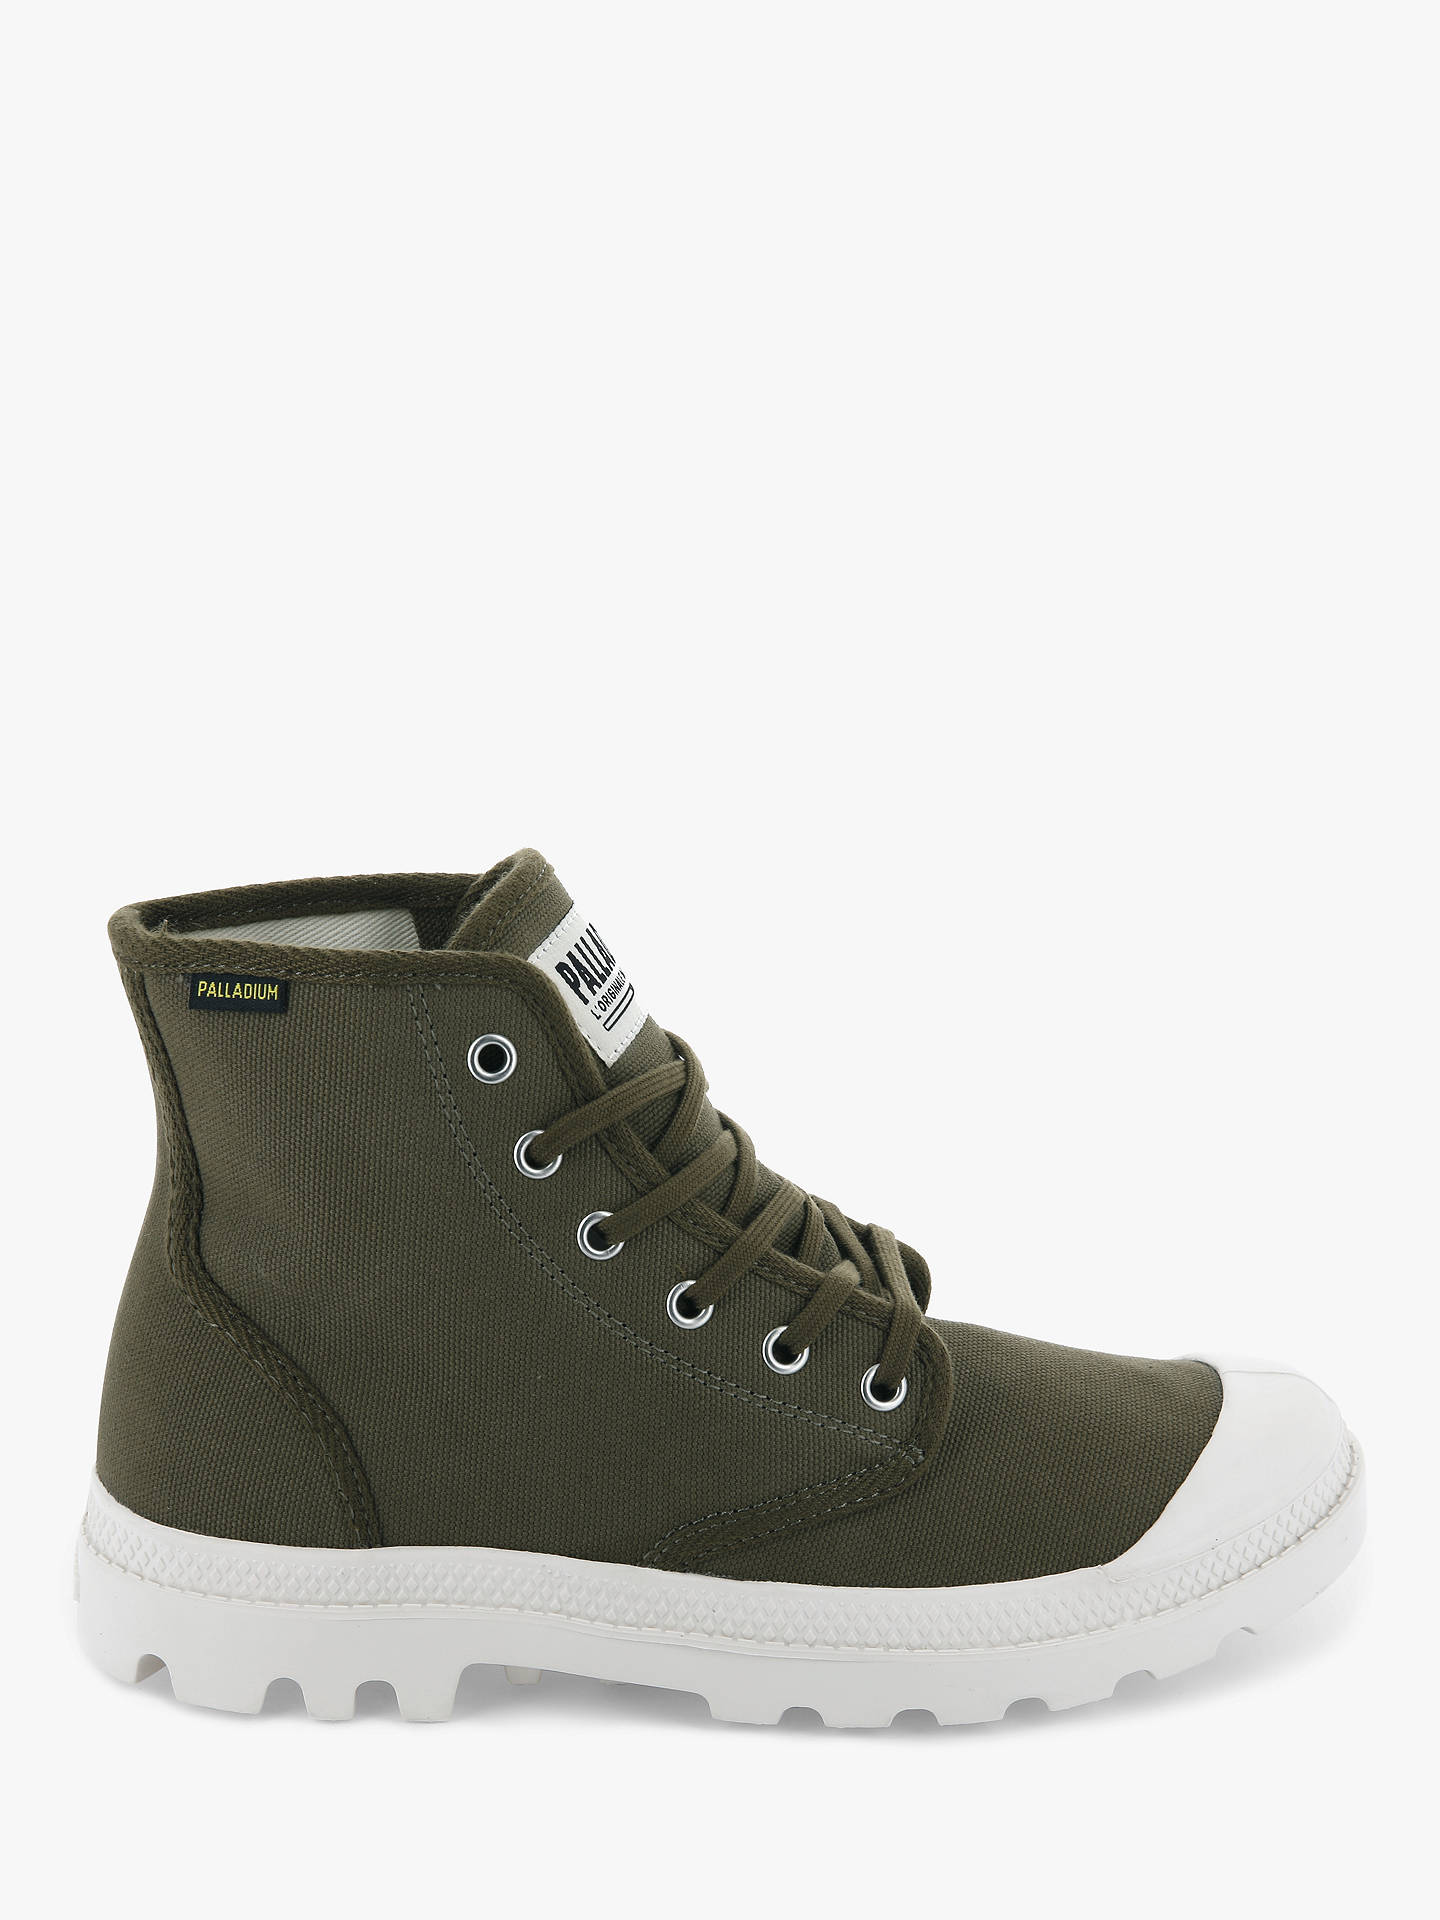 Palladium Pampa Hi Originale Canvas Boots, Military Olive at